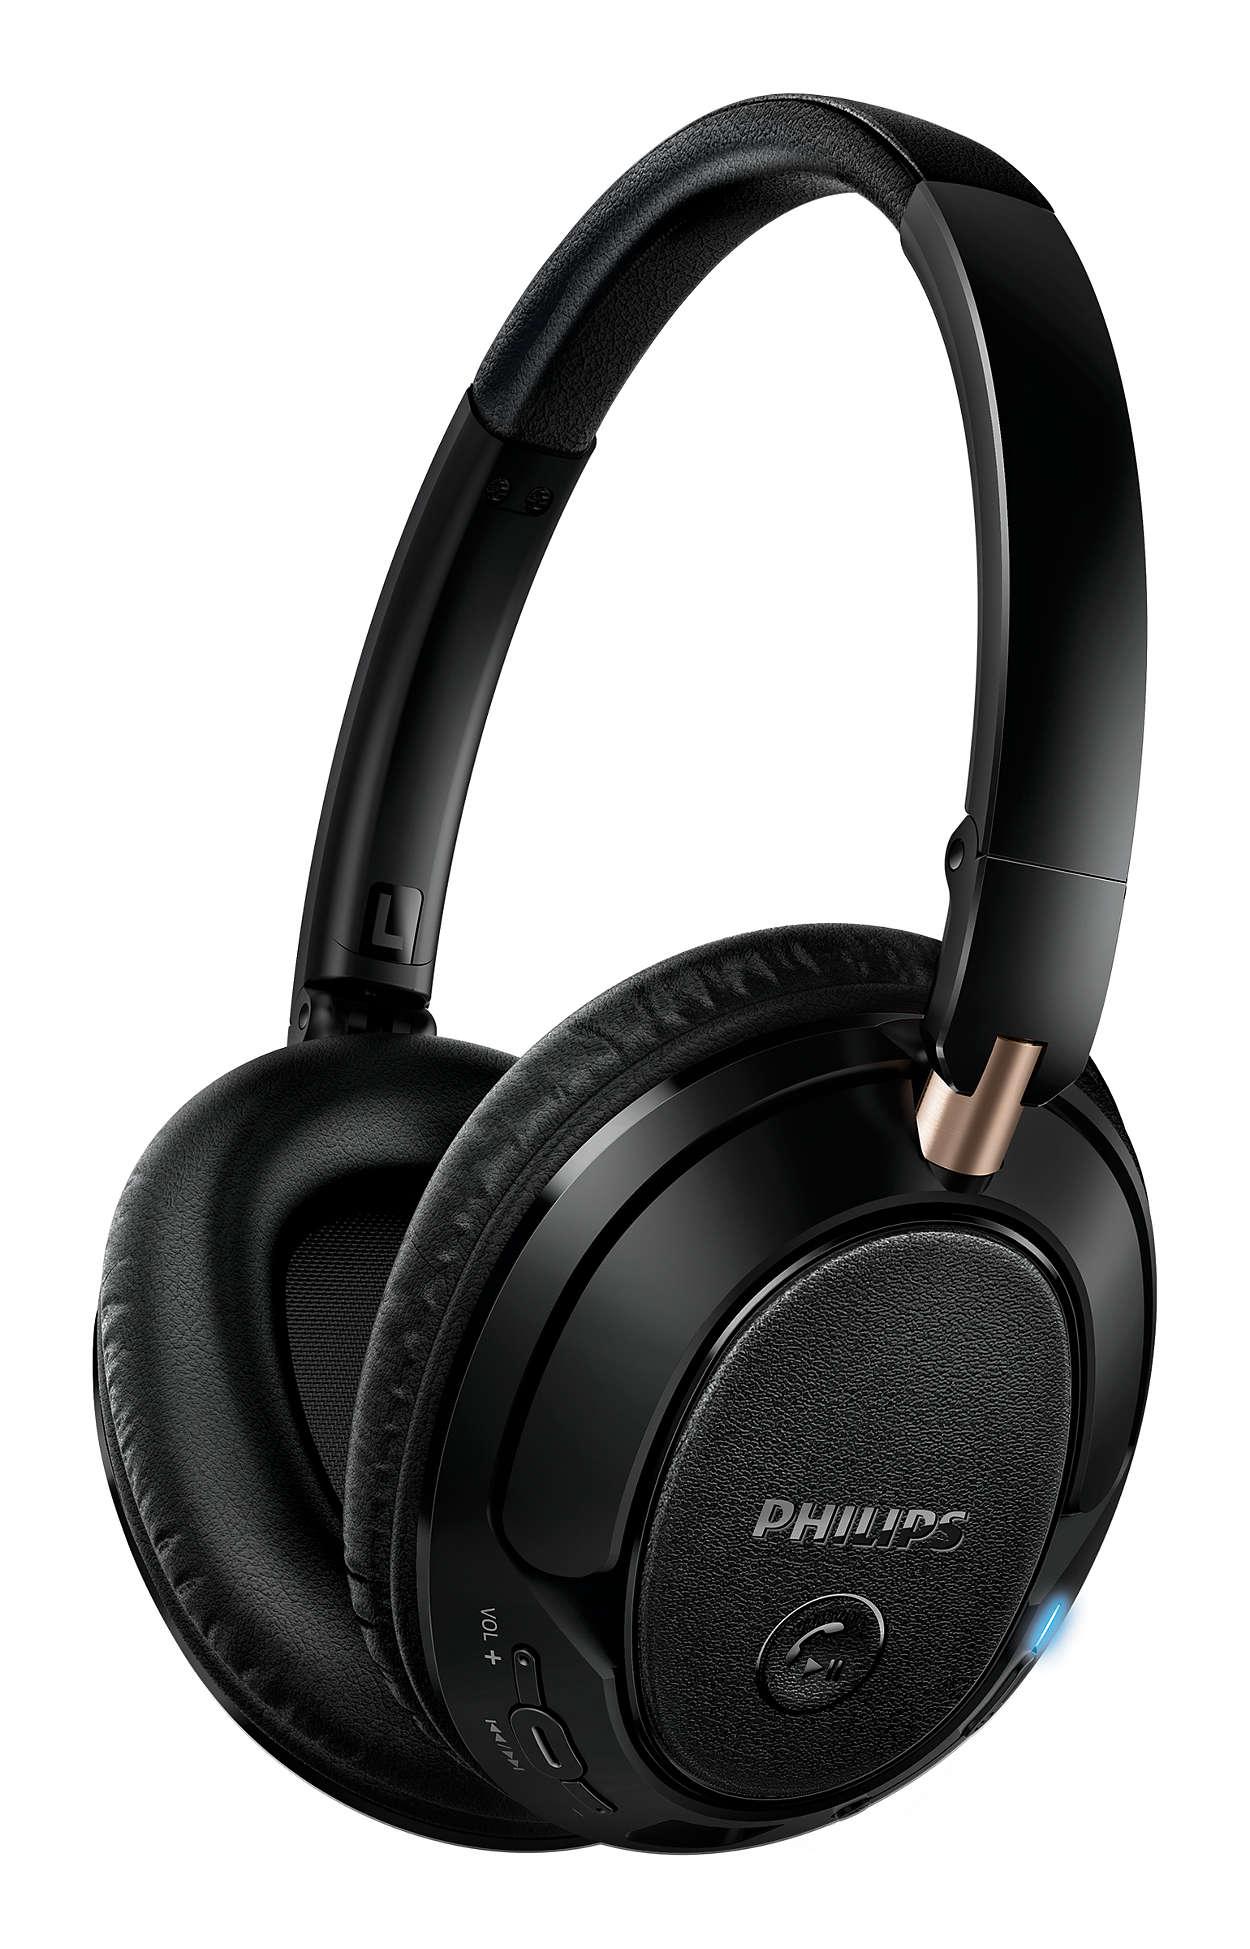 a6af6fee272 Wireless Bluetooth® headphones SHB7250/00 | Philips